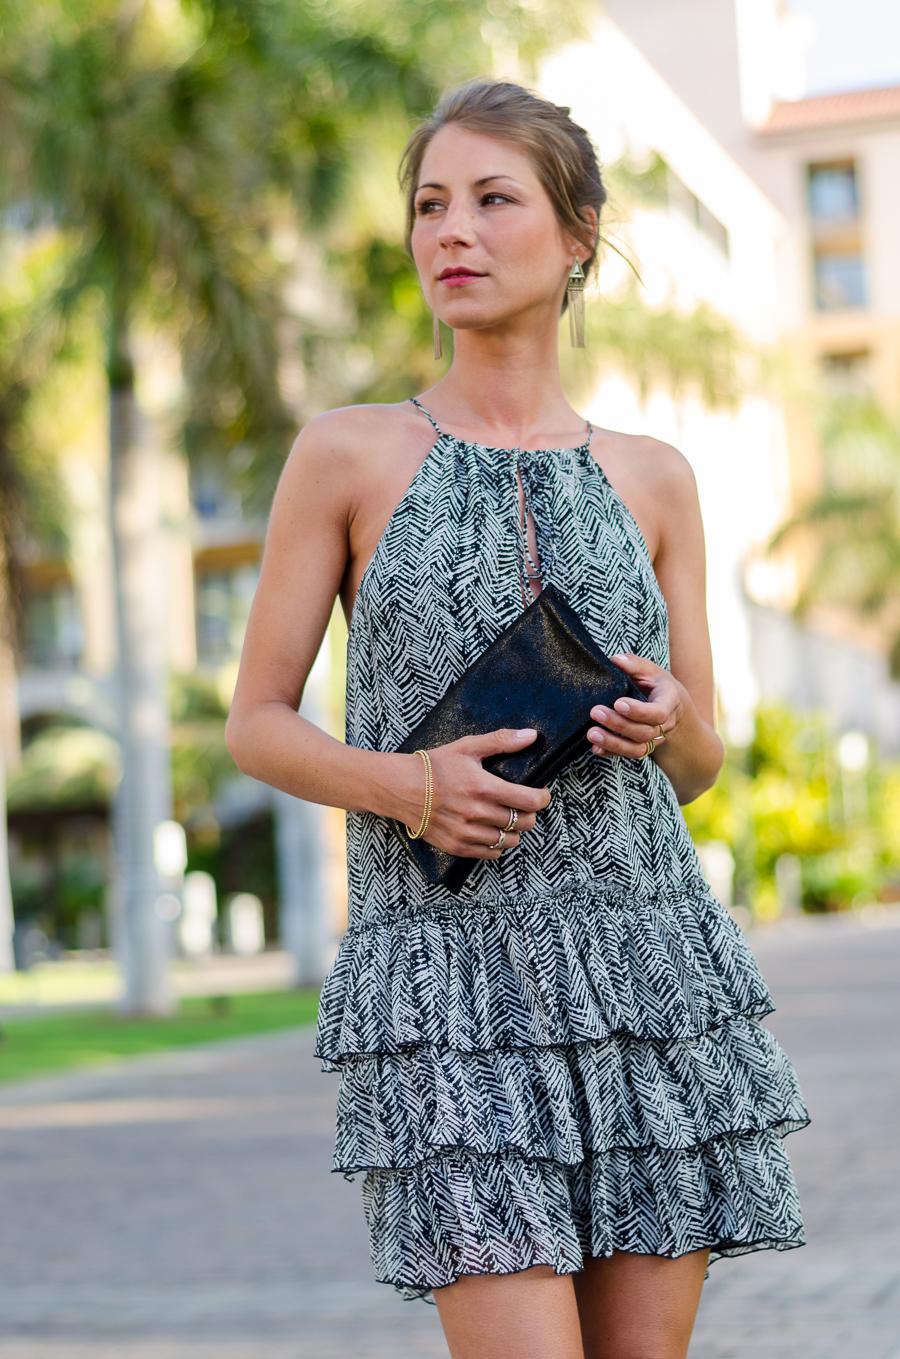 zara dress elegant summer outfit fashion blog